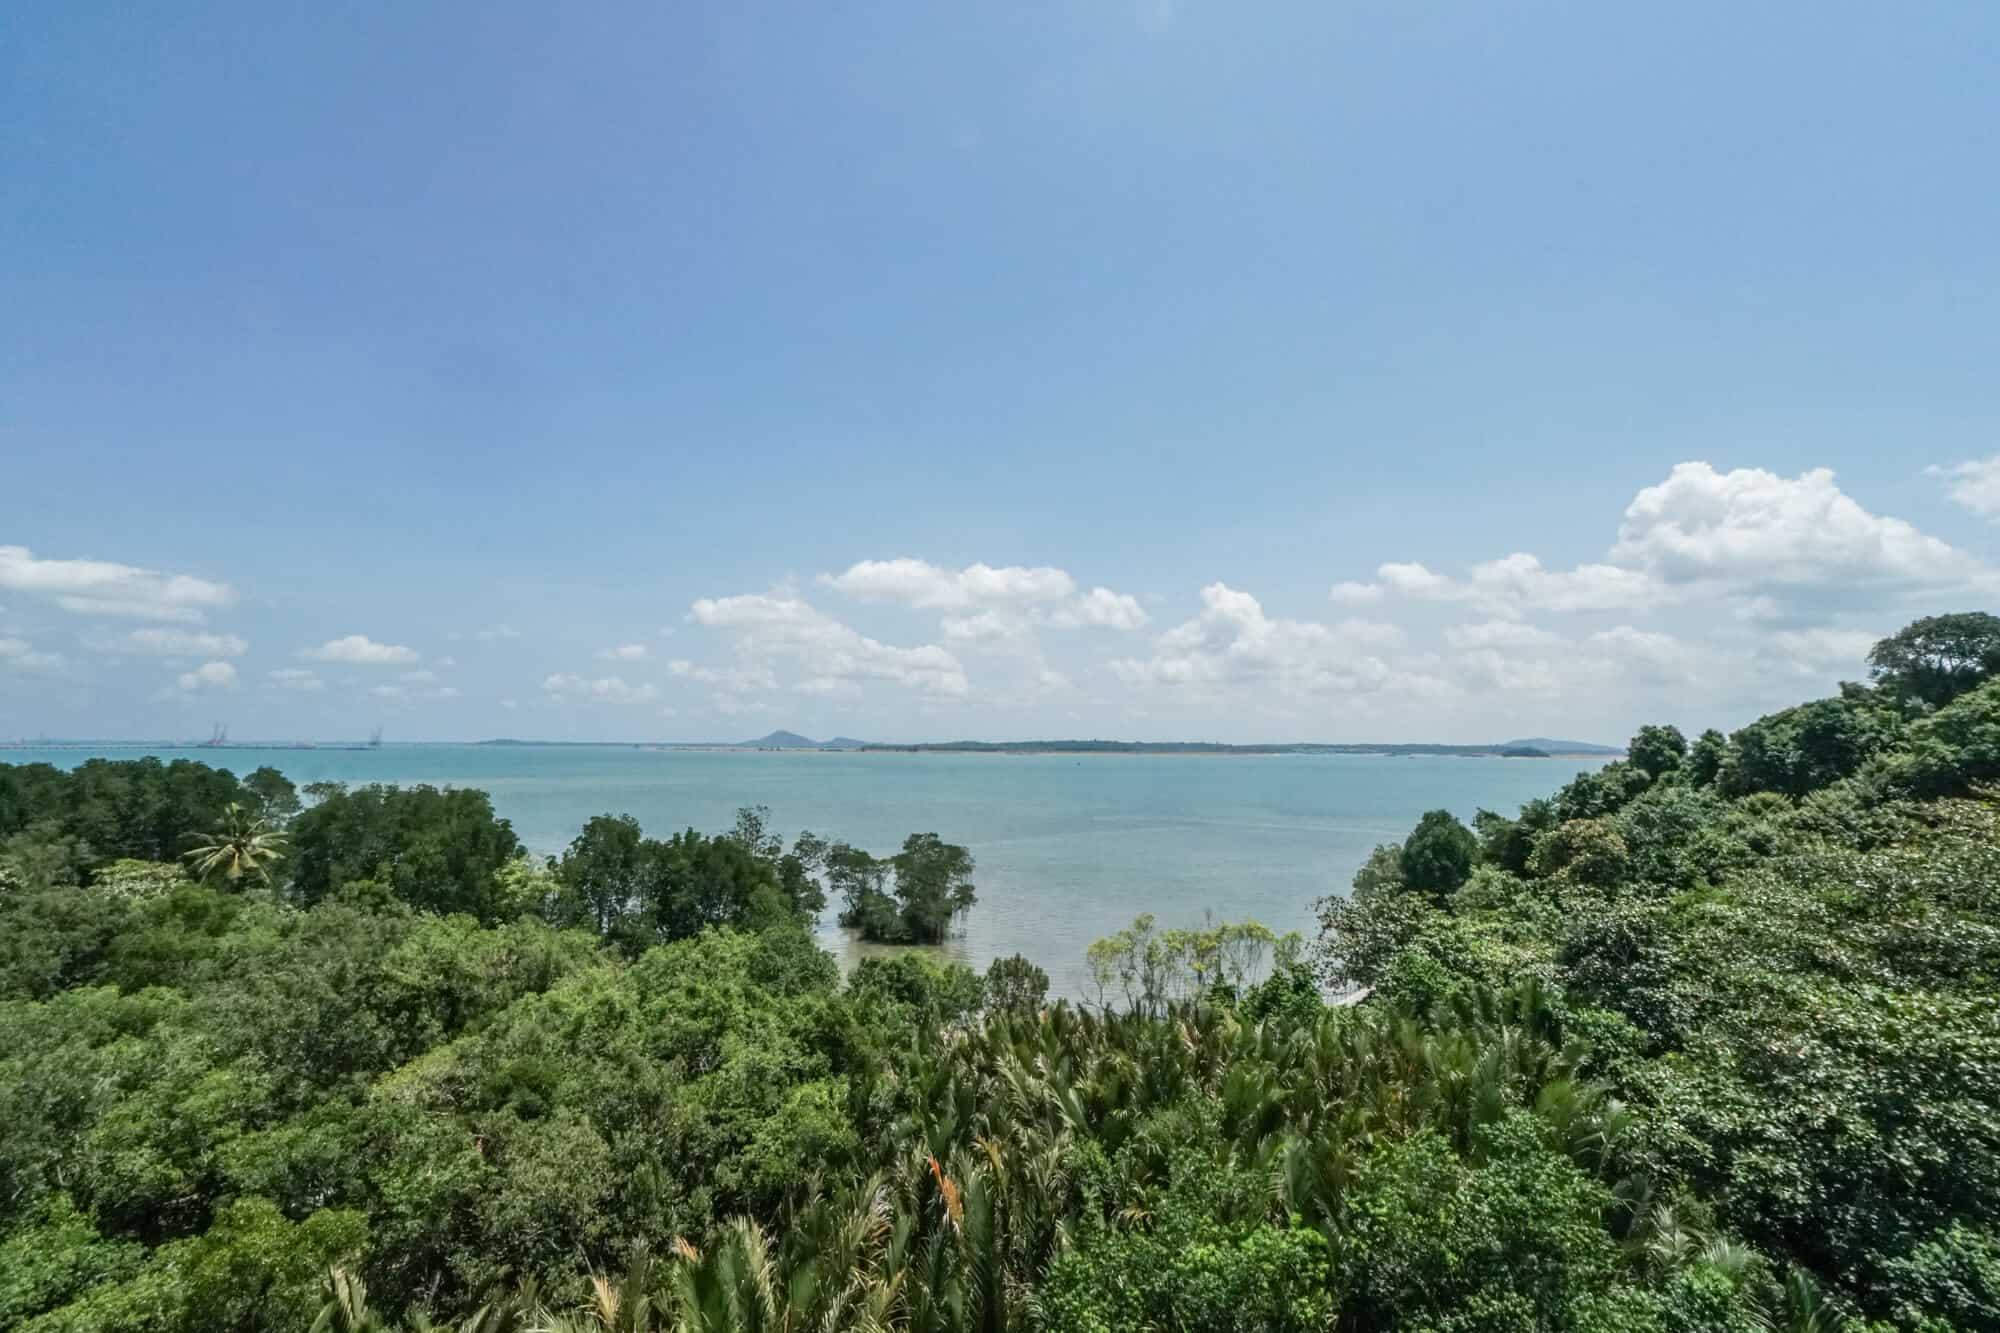 Pulau Ubin Check Jawa Wetlands Lookout